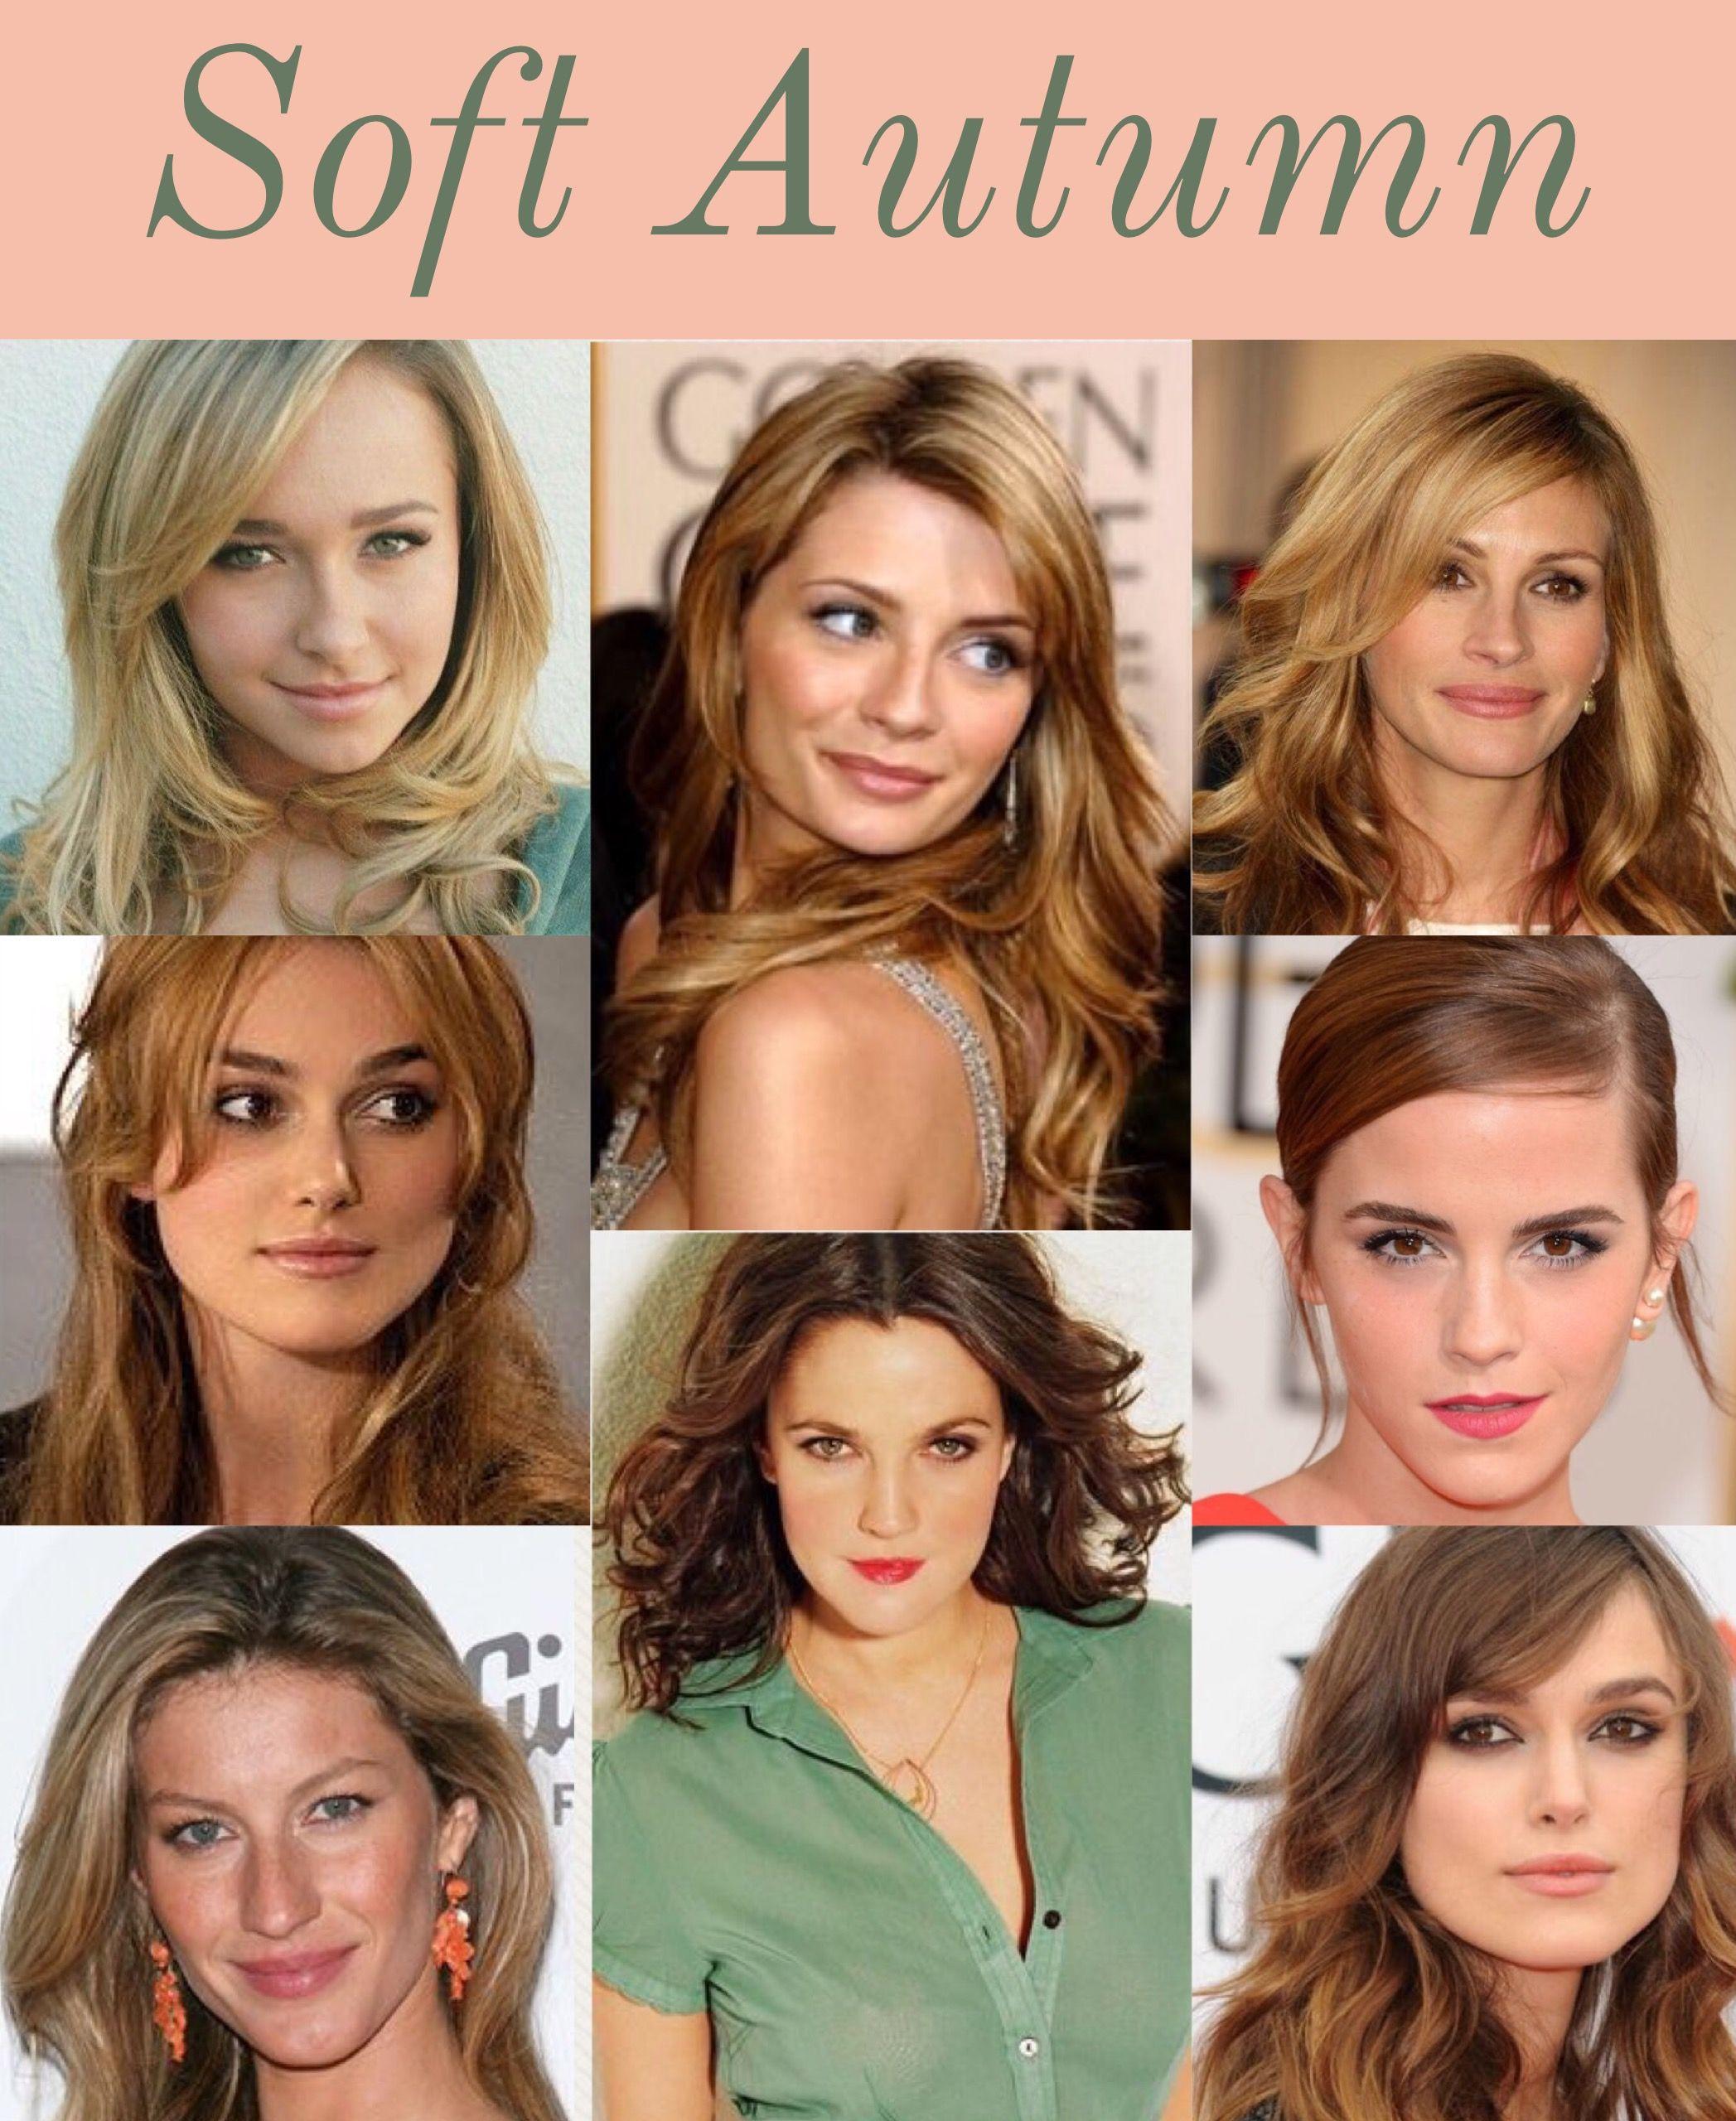 Hair Color Choices Soft Autumn Makeup Hair Color For Black Hair Hair Color For Warm Skin Tones